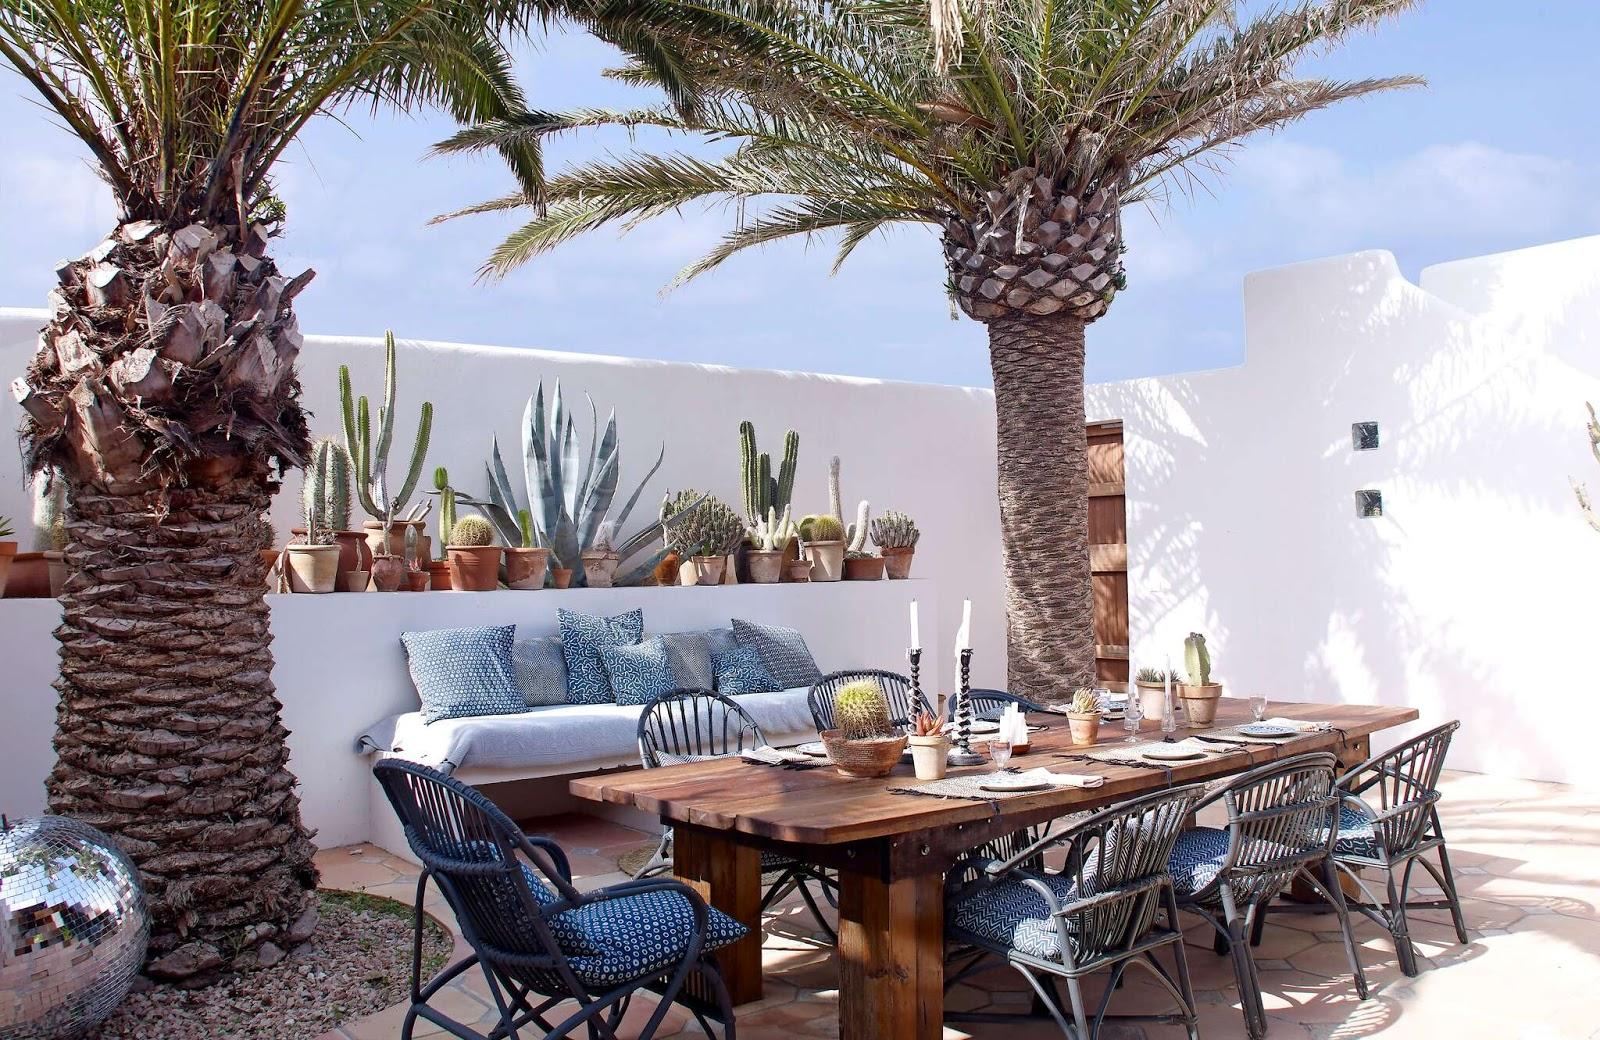 Jade Jagger's island paradise in Formentera, Spain